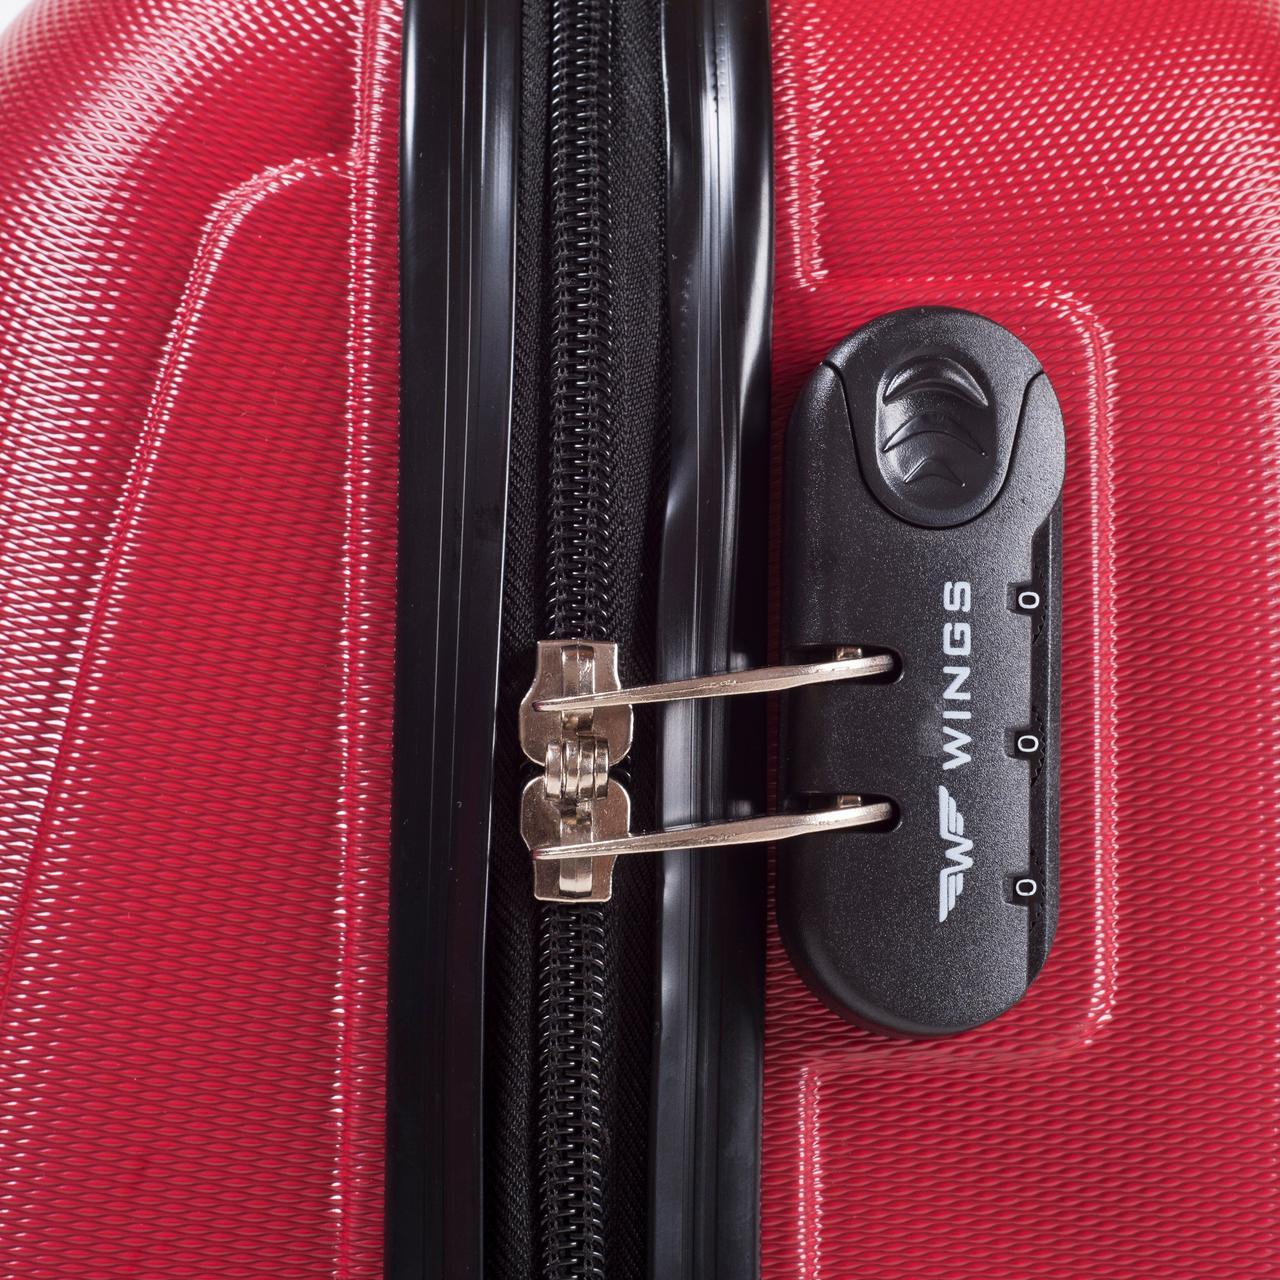 962f53dcb4b6 ... Пластиковый чемодан S (маленький) на четырёх колёса Wings цвет blue,  фото 3